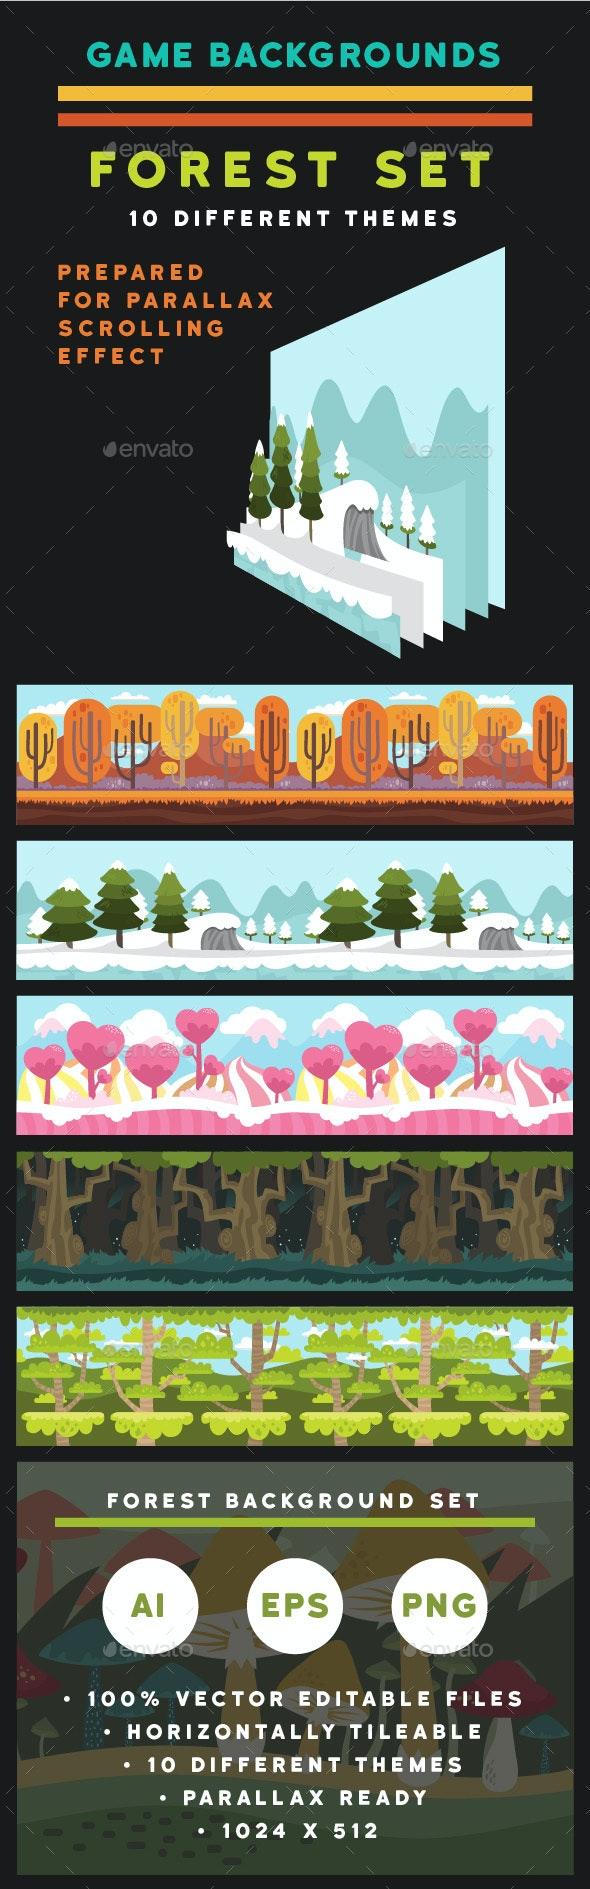 Forest Game Background Set - Backgrounds Game Assets